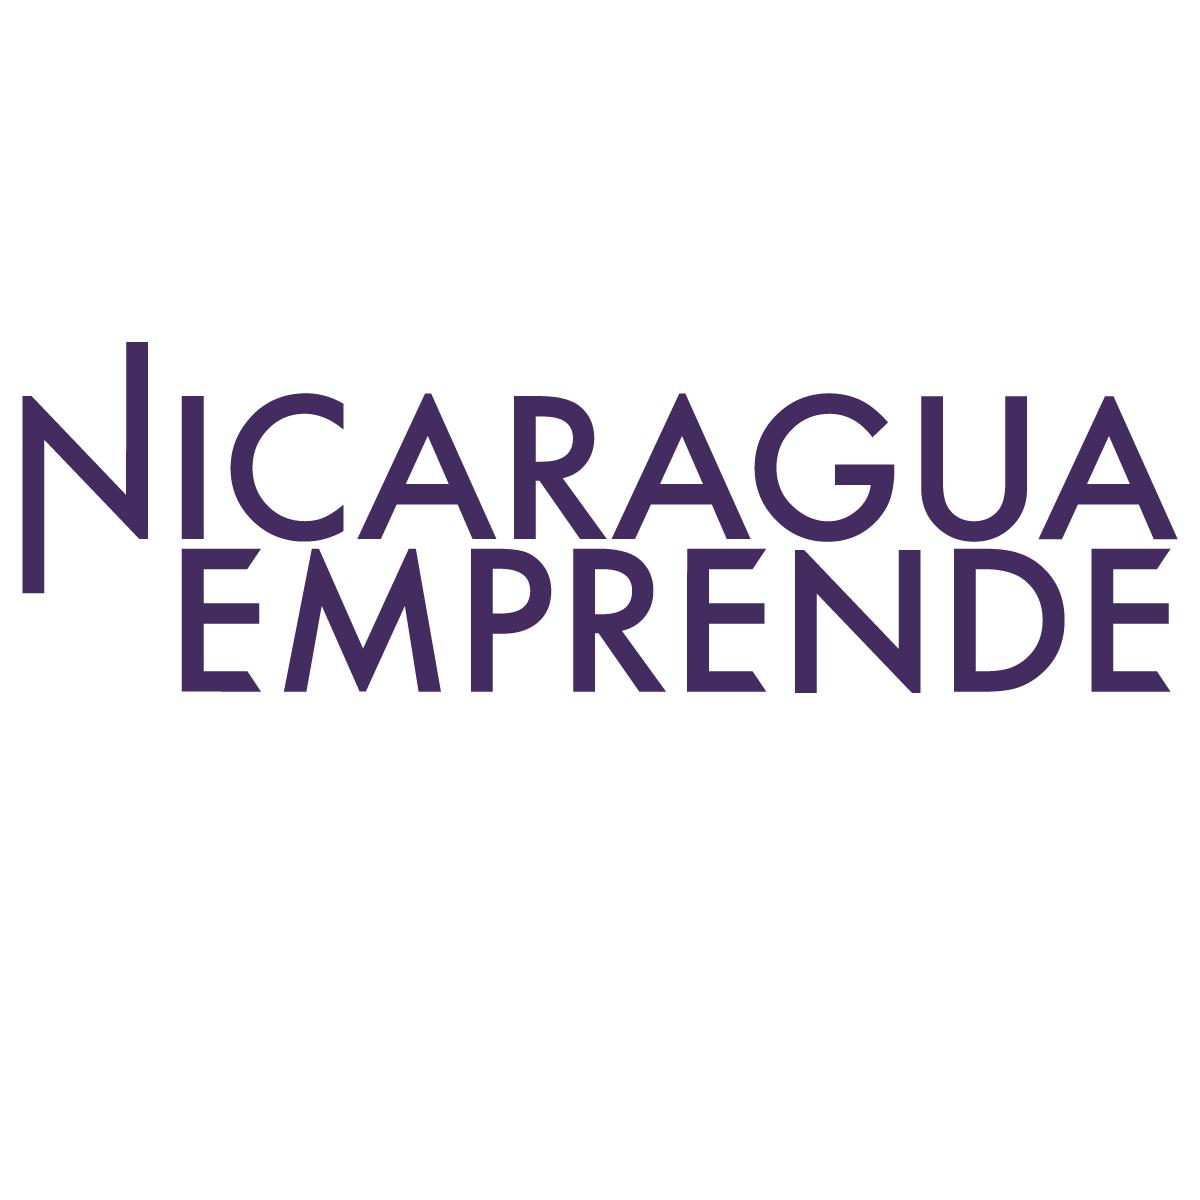 Nicaragua Emprende